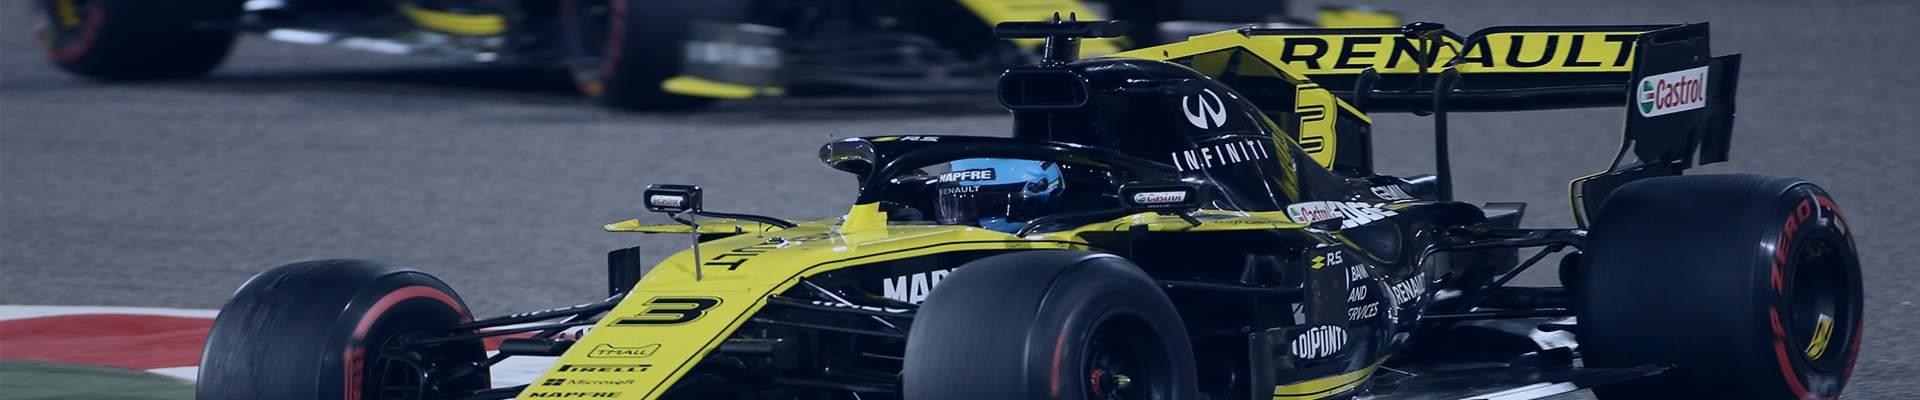 Renault_F1_Team_Stronger_and_Safer_1920x400.jpg